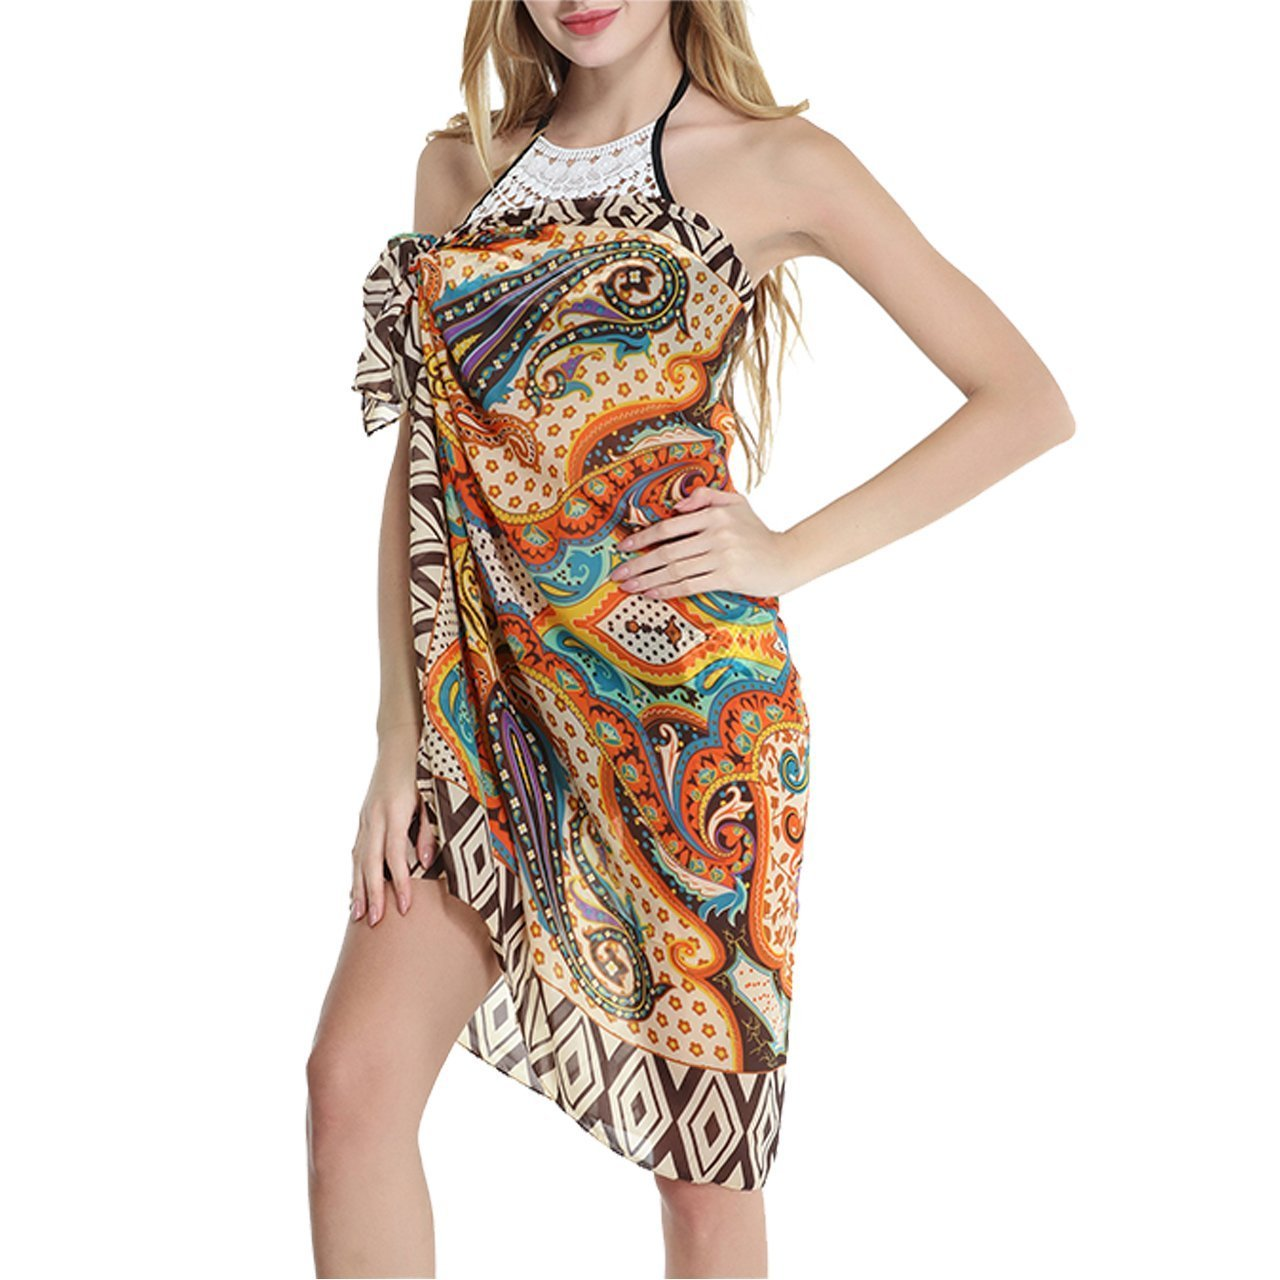 CHIC DIARY Women\'s Bohemian Printing Swimsuit Cover up Sarong Beachwear Wrap,Coffee (Coffee)